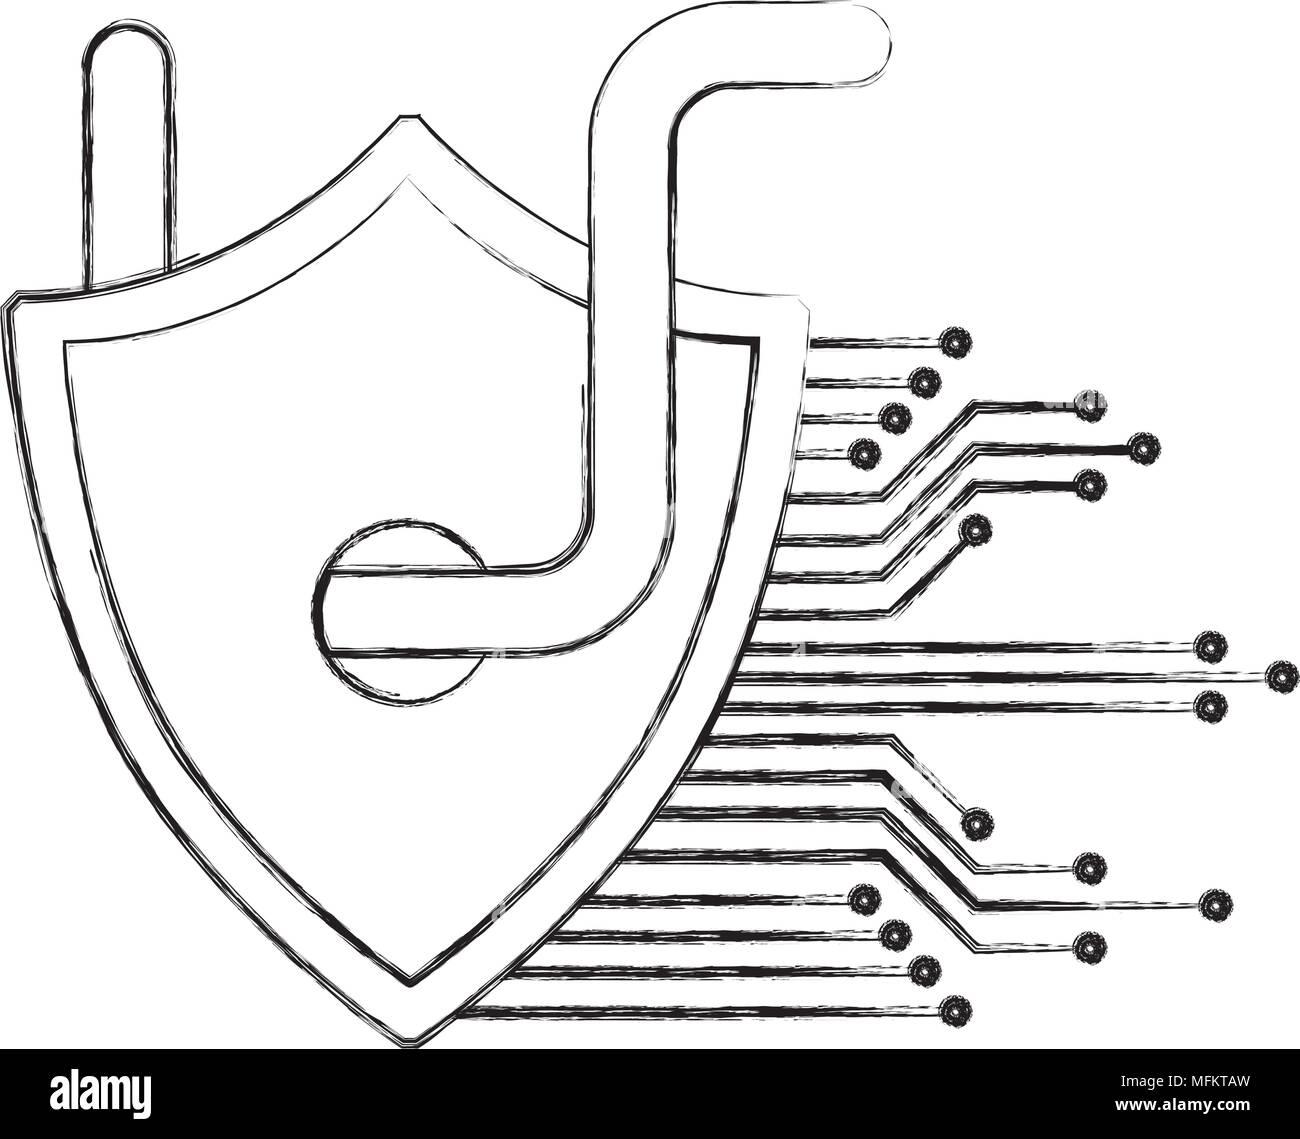 Cyber Security Shield protección virus gusano tecnología circuito hacking Imagen De Stock